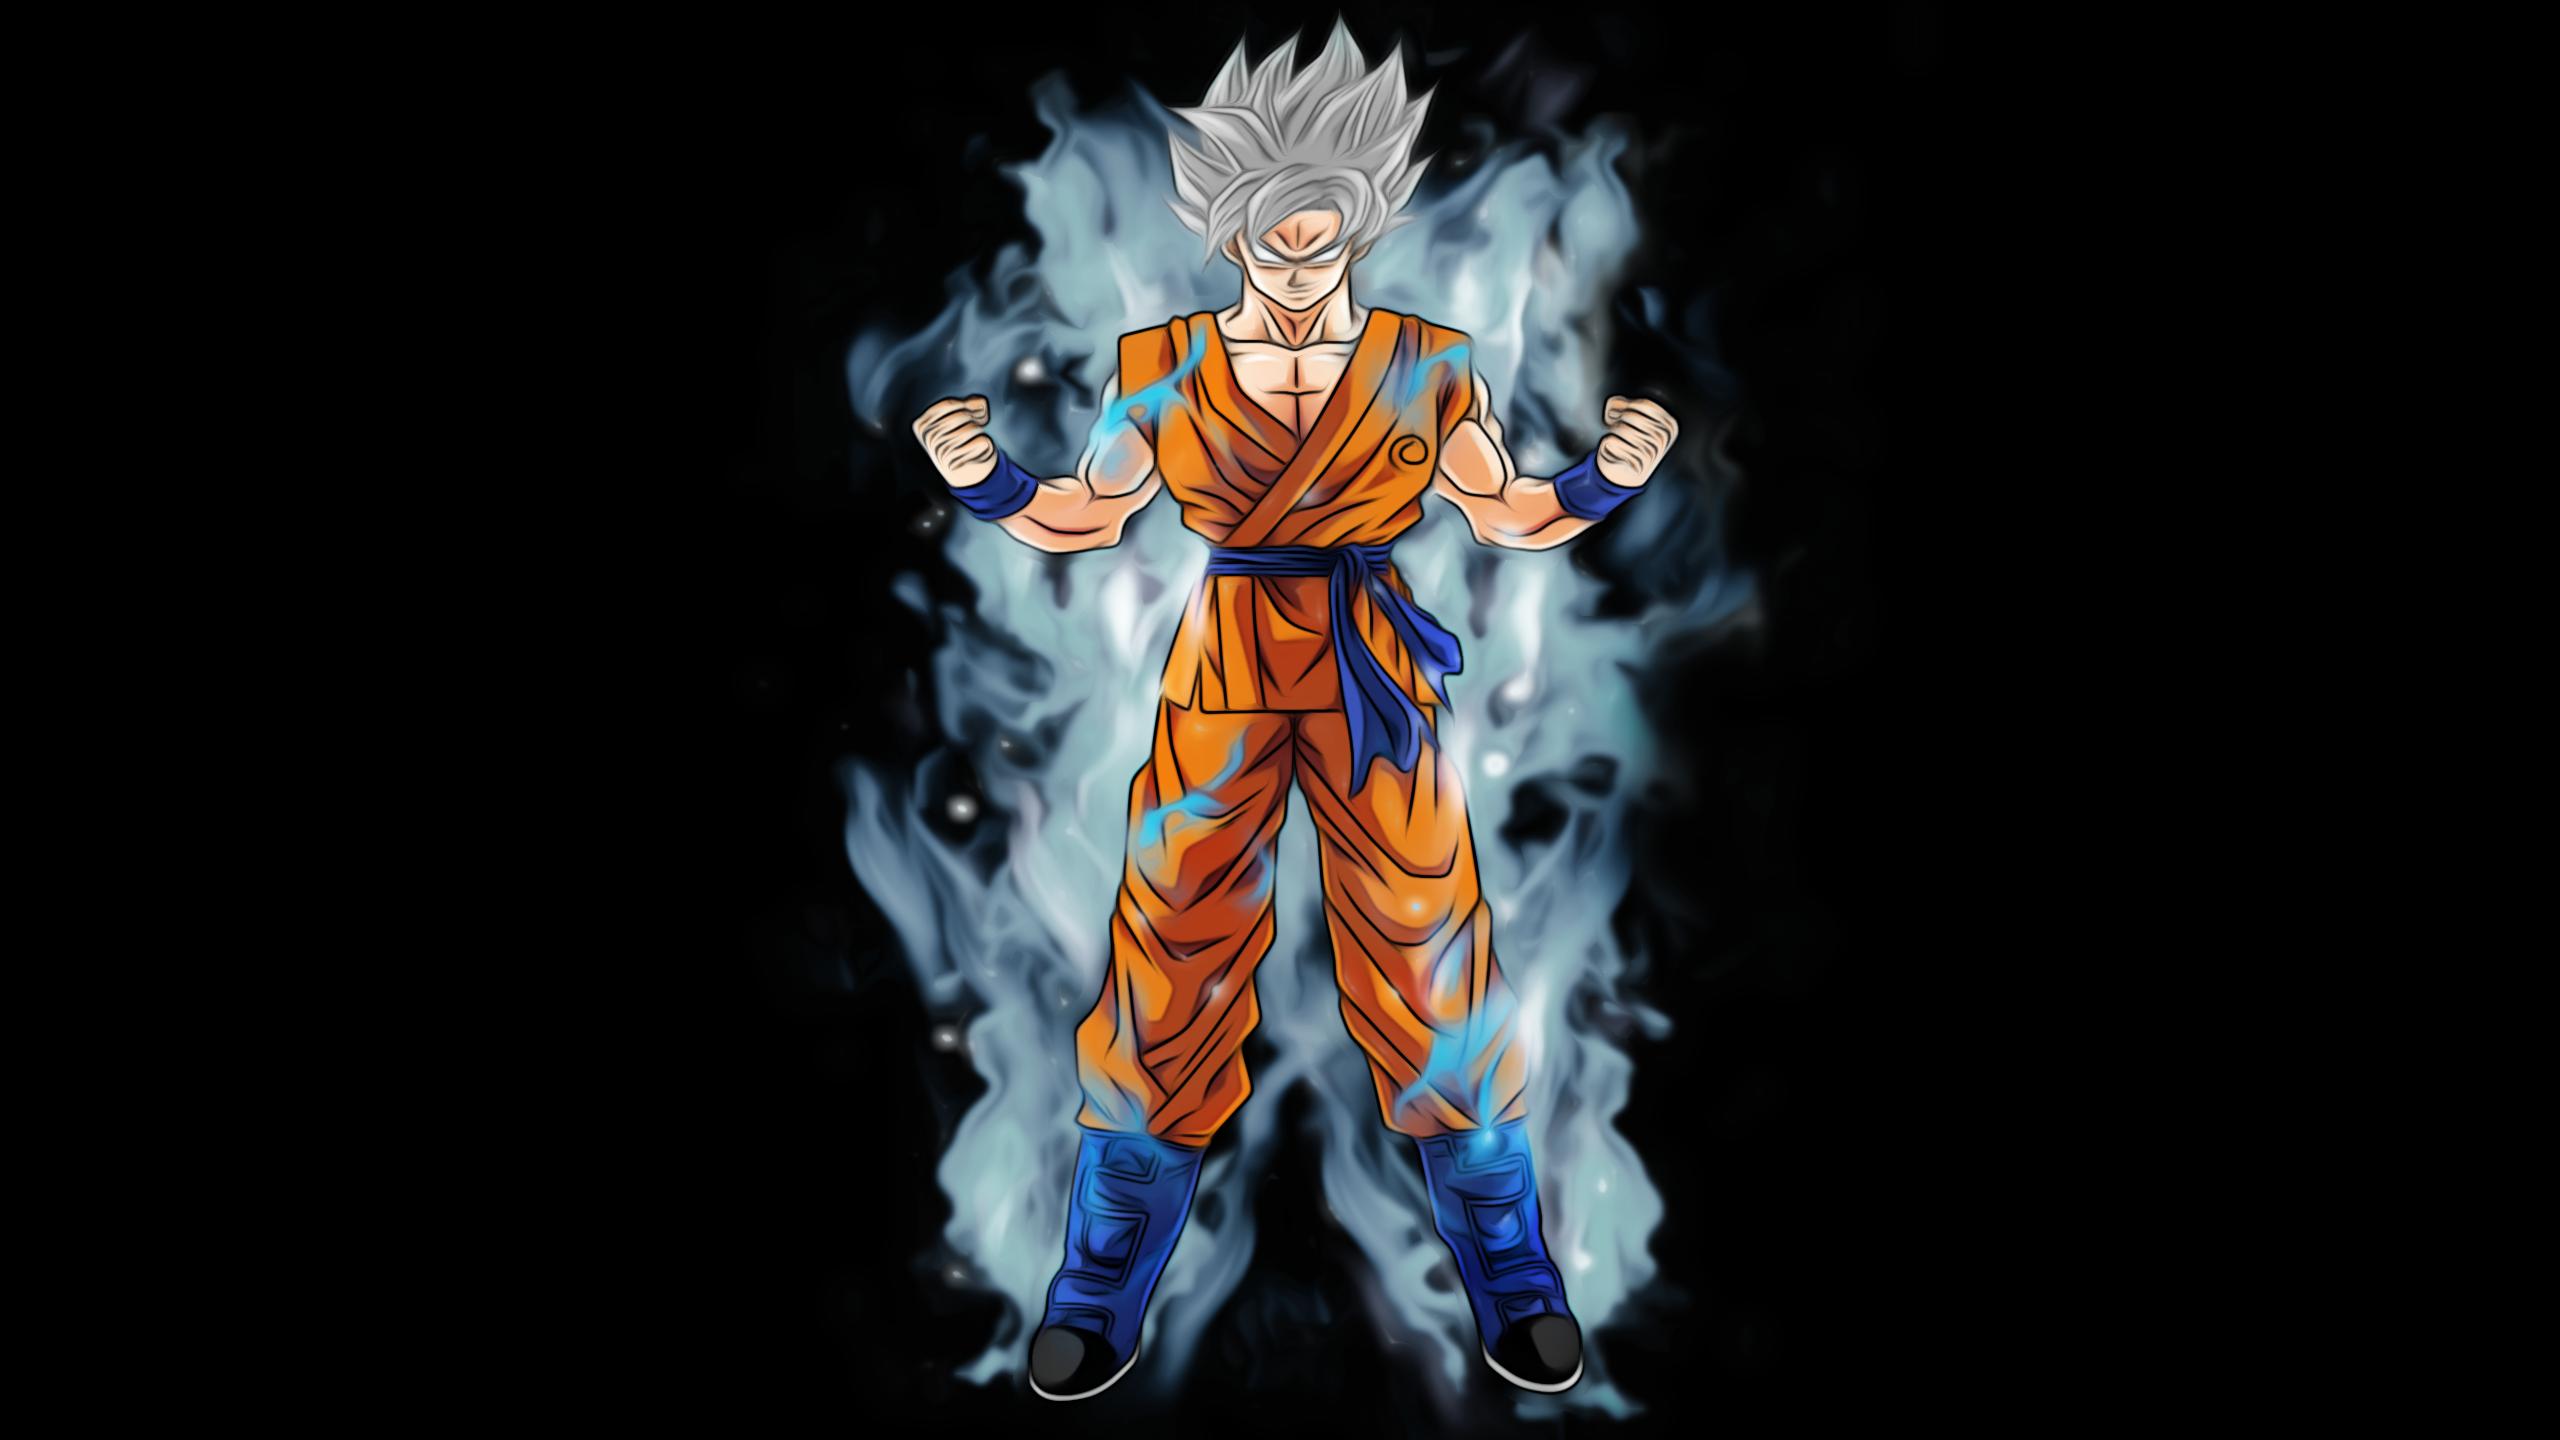 Goku Super Saiyan White Hd Wallpaper Background Image 2560x1440 Id 845601 Wallpaper Abyss